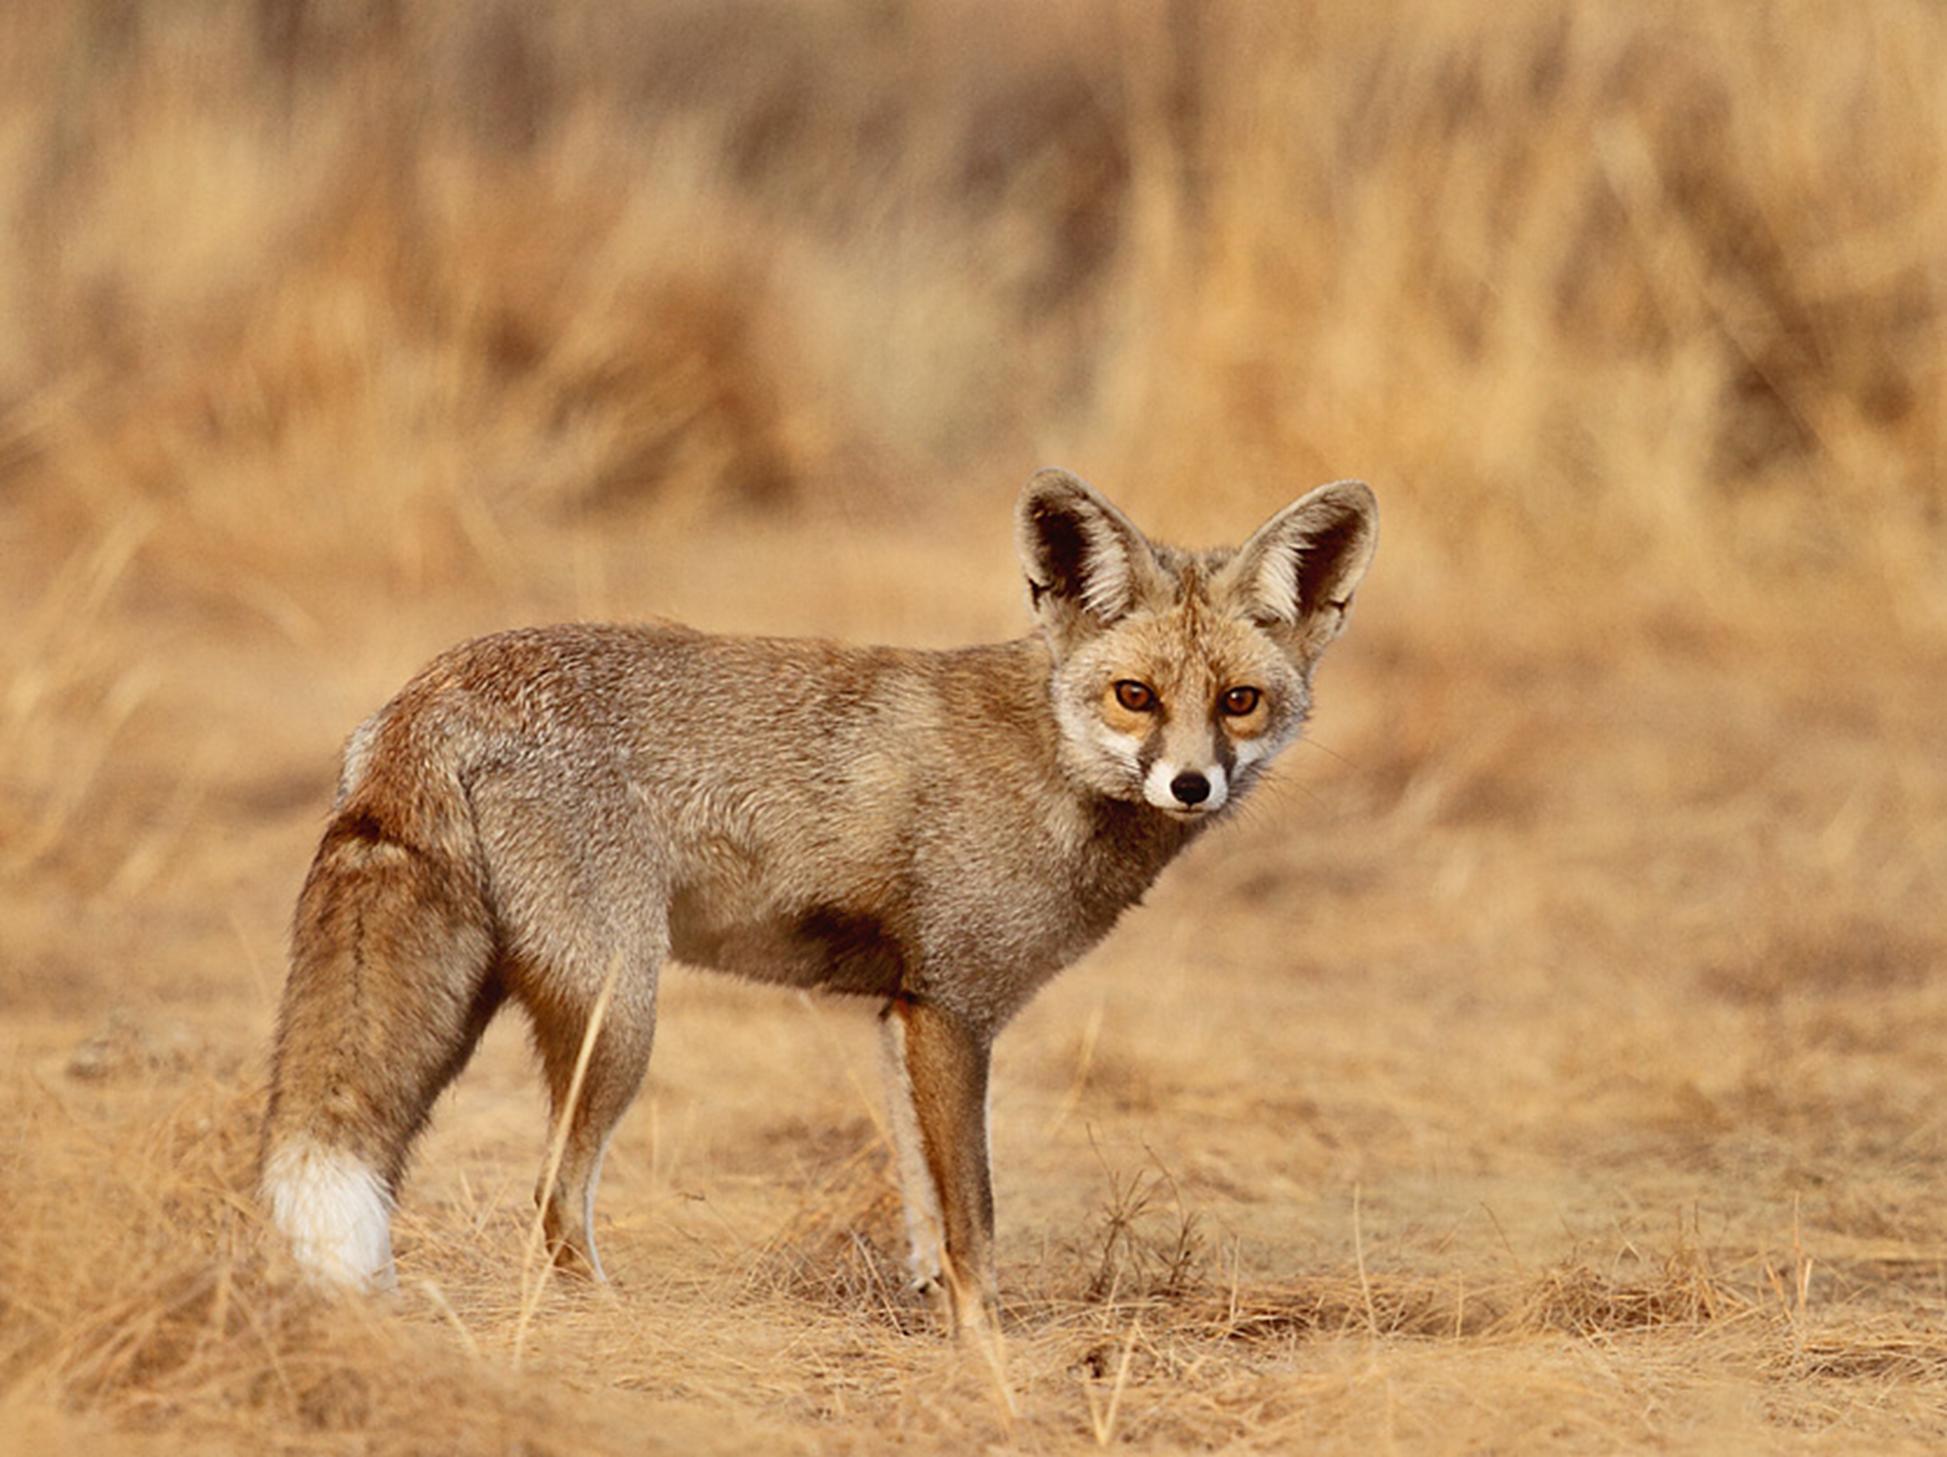 Indian desert fox. It is found mainly in the Thar Desert of Rajasthan and Gujarat. Photo by Gobind Sagar Bhardwaj.